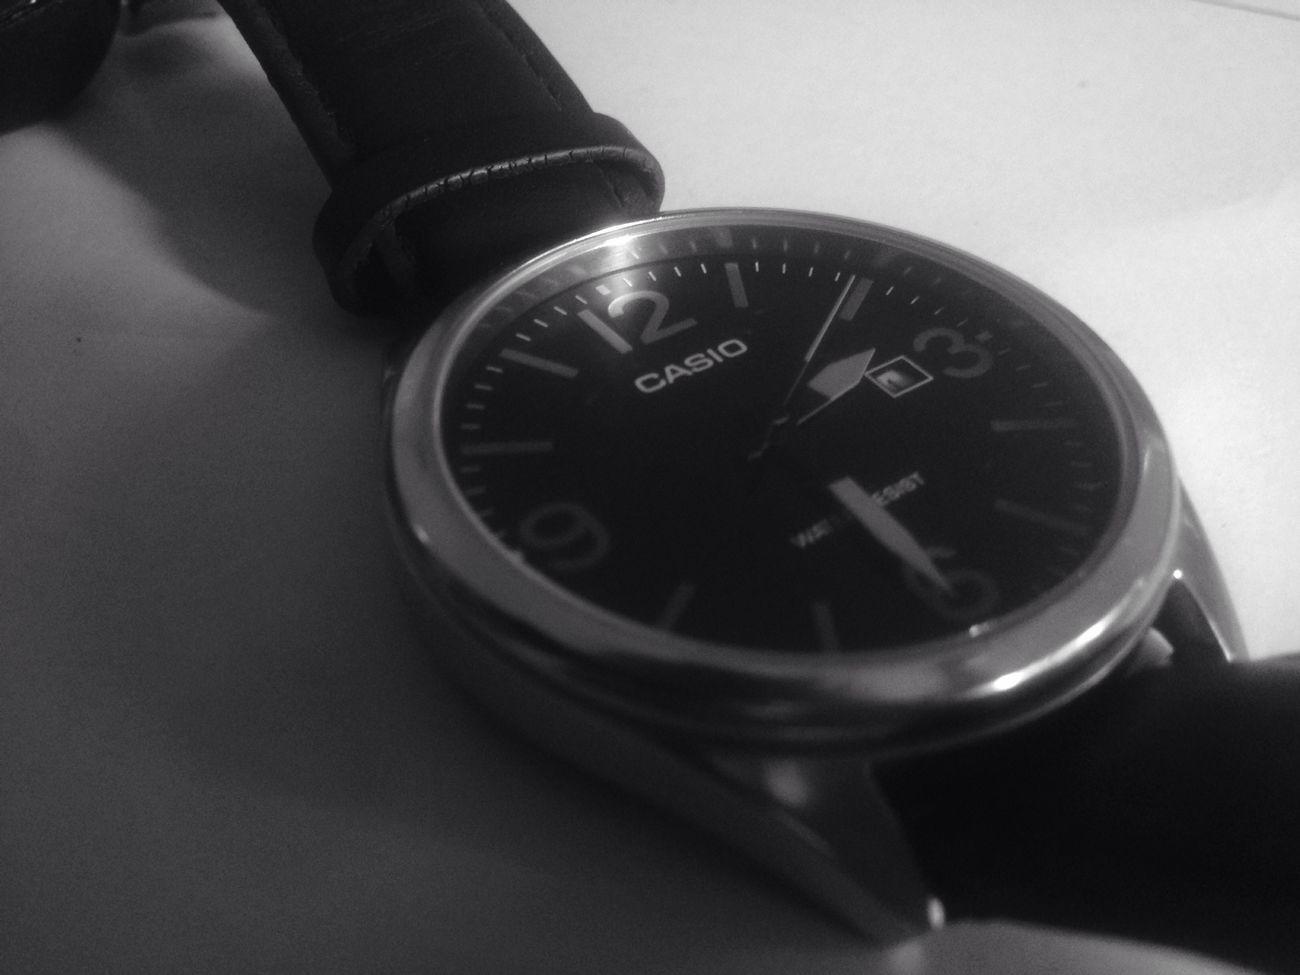 Black And White Casio Watch